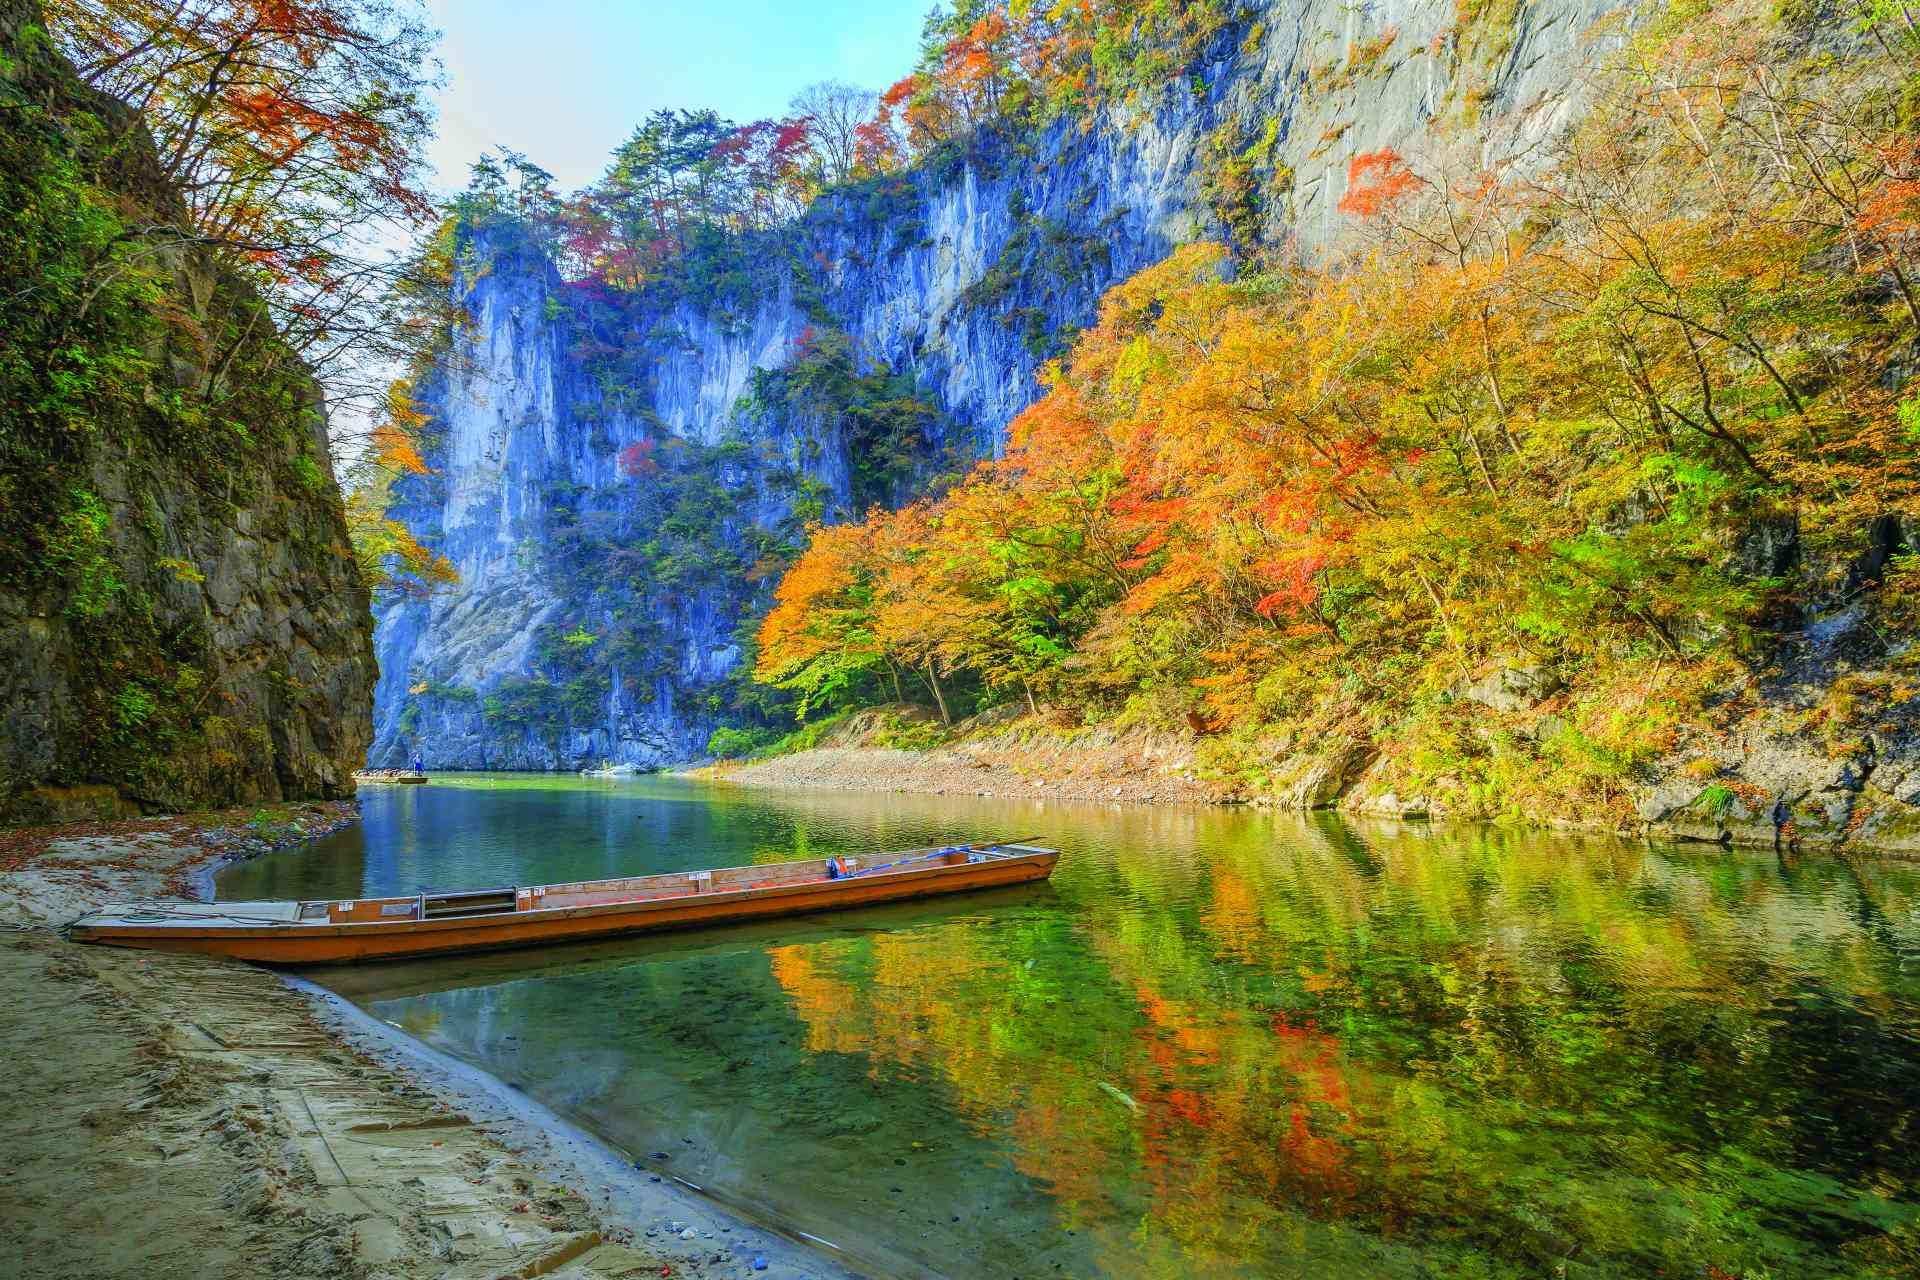 Geibikei Gorge, Iwate, Japan